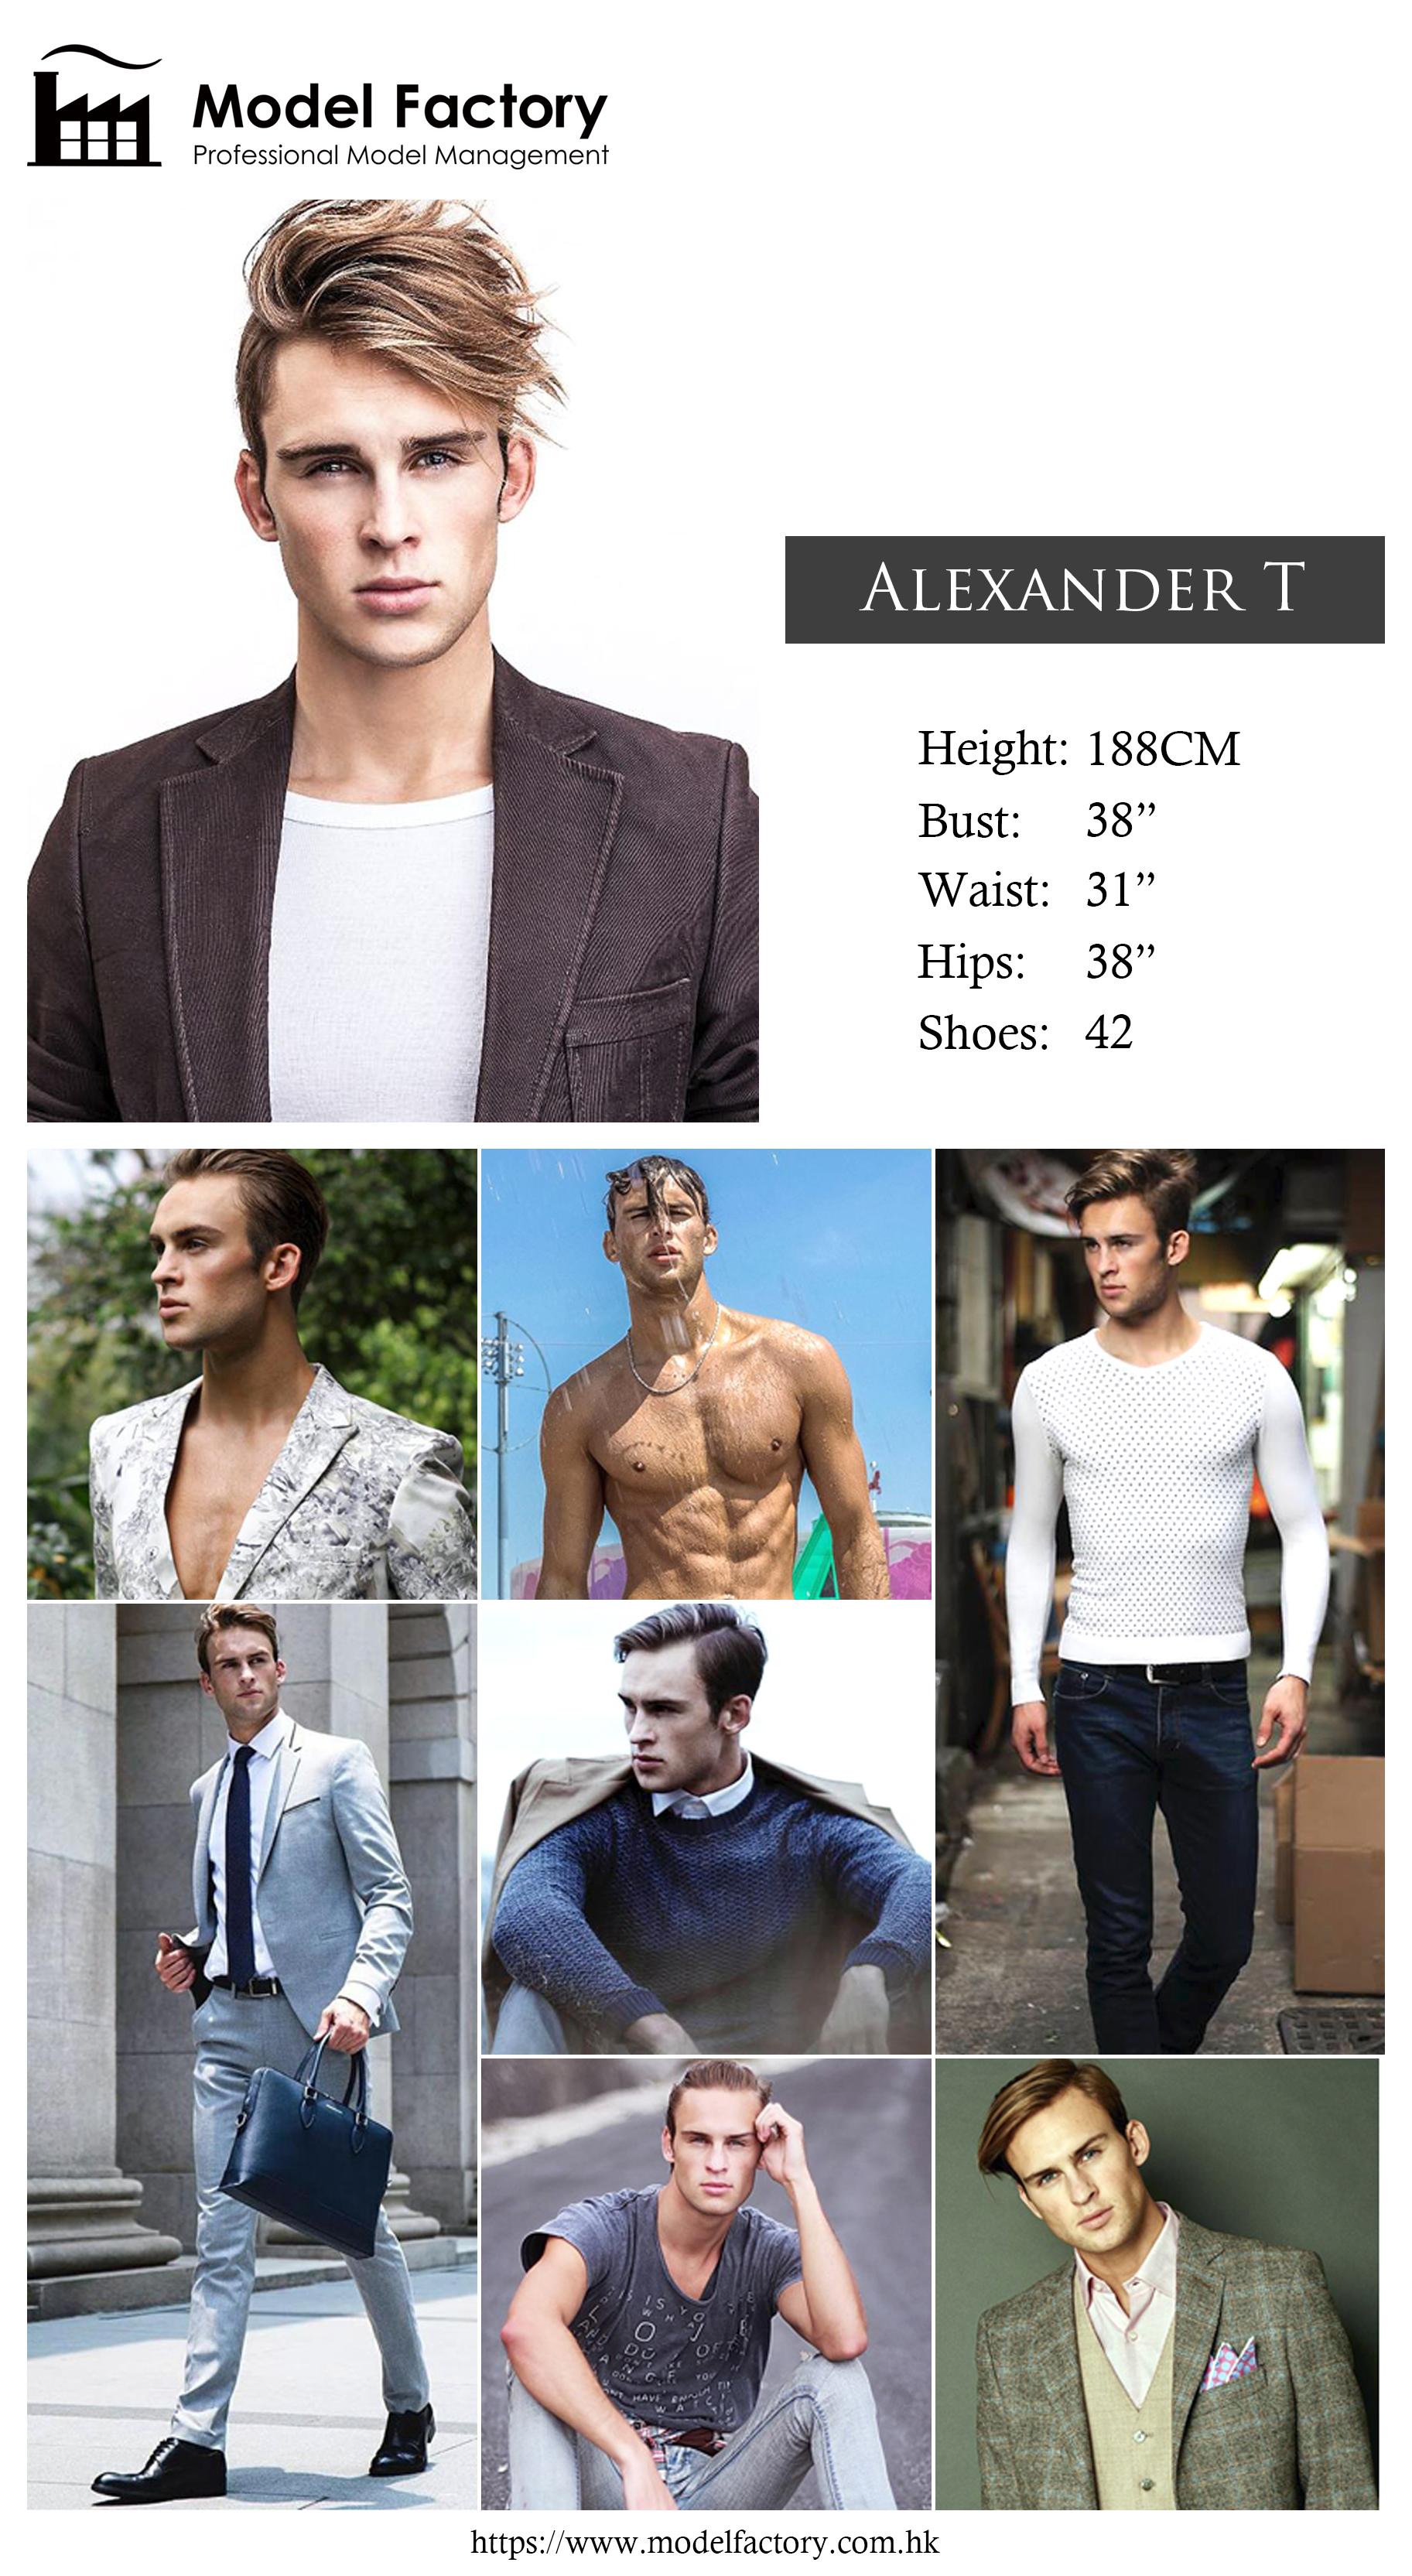 Model Factory Caucasian Male Model AlexanderT